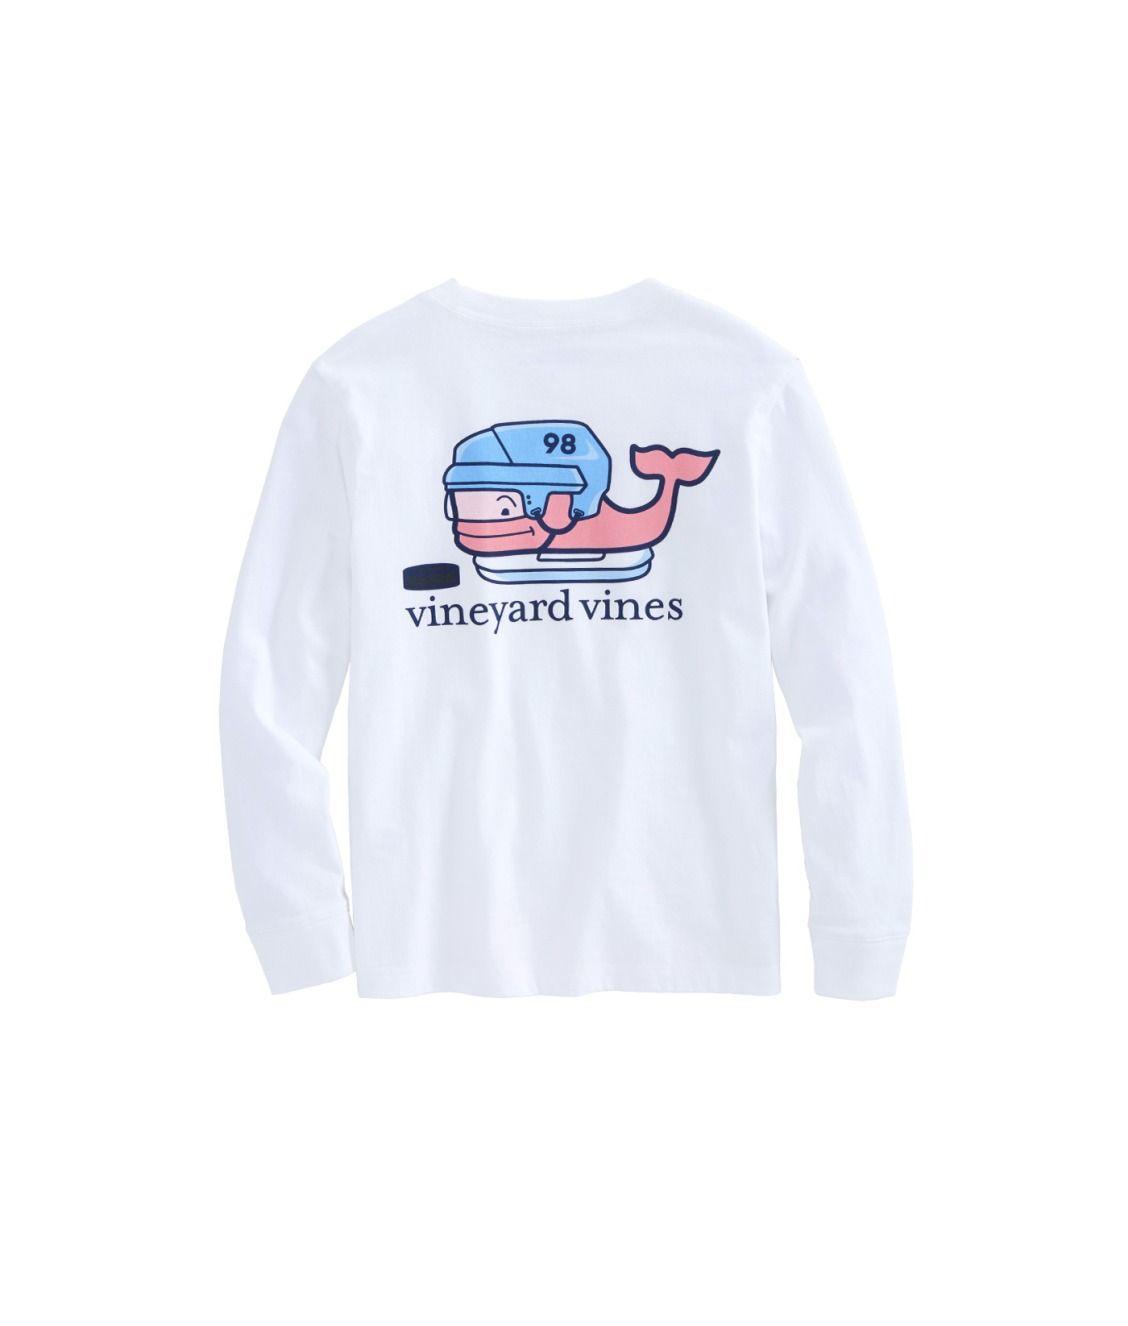 0decd9a5d770 Boys Long-Sleeve Hockey Whale Pocket T-Shirt | style | Hockey shirts ...